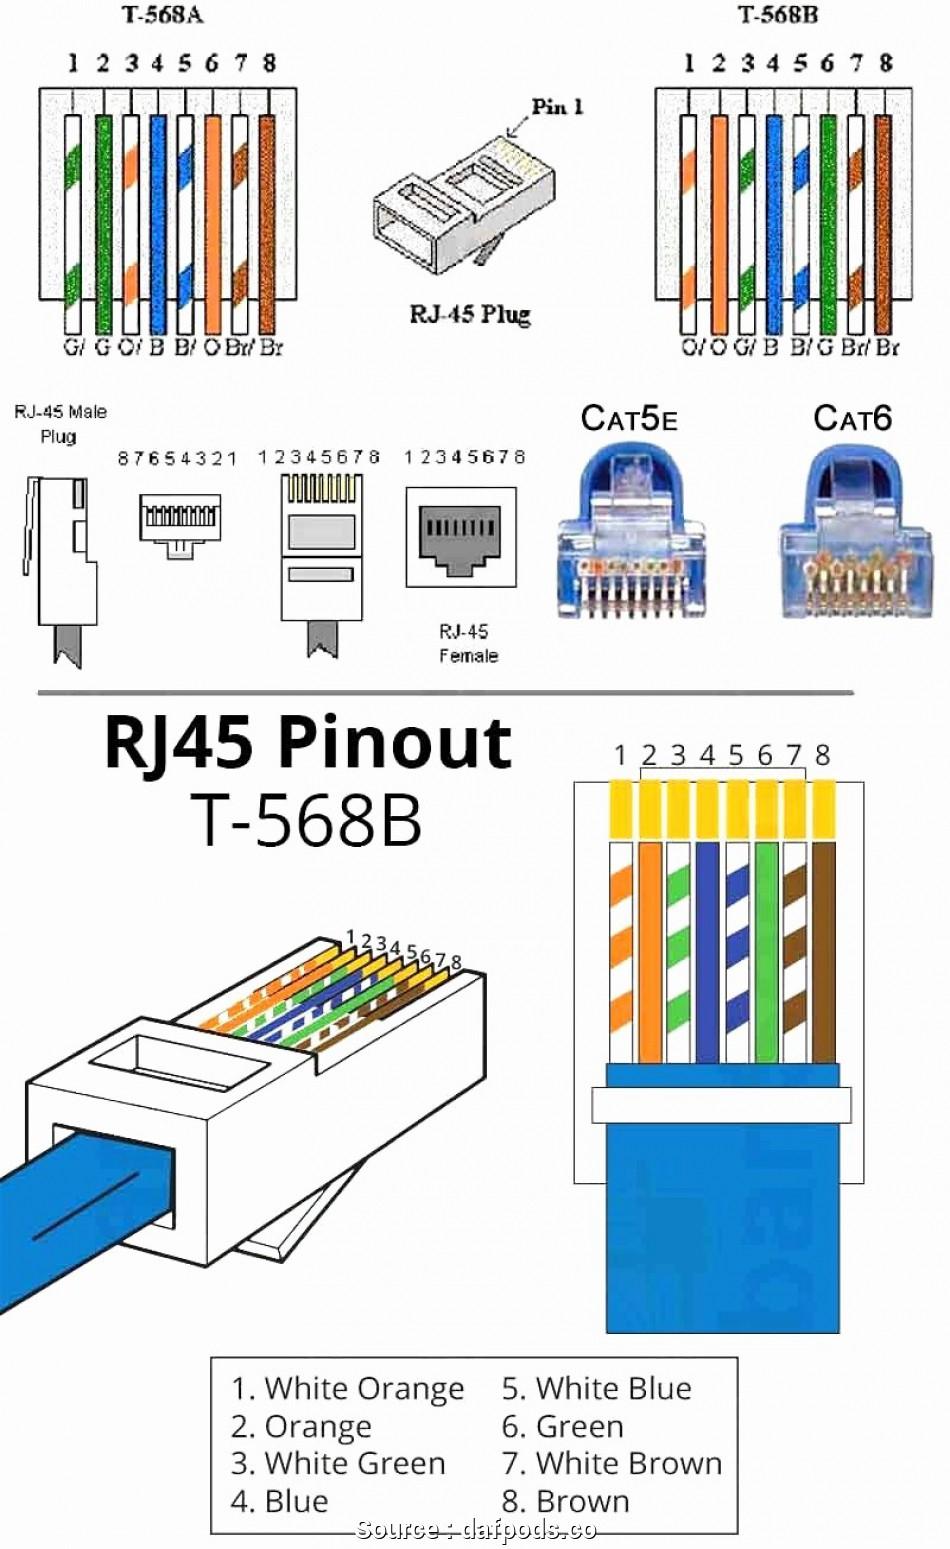 Cat 6 Schematic | Wiring Diagram - Cat 3 Wiring Diagram